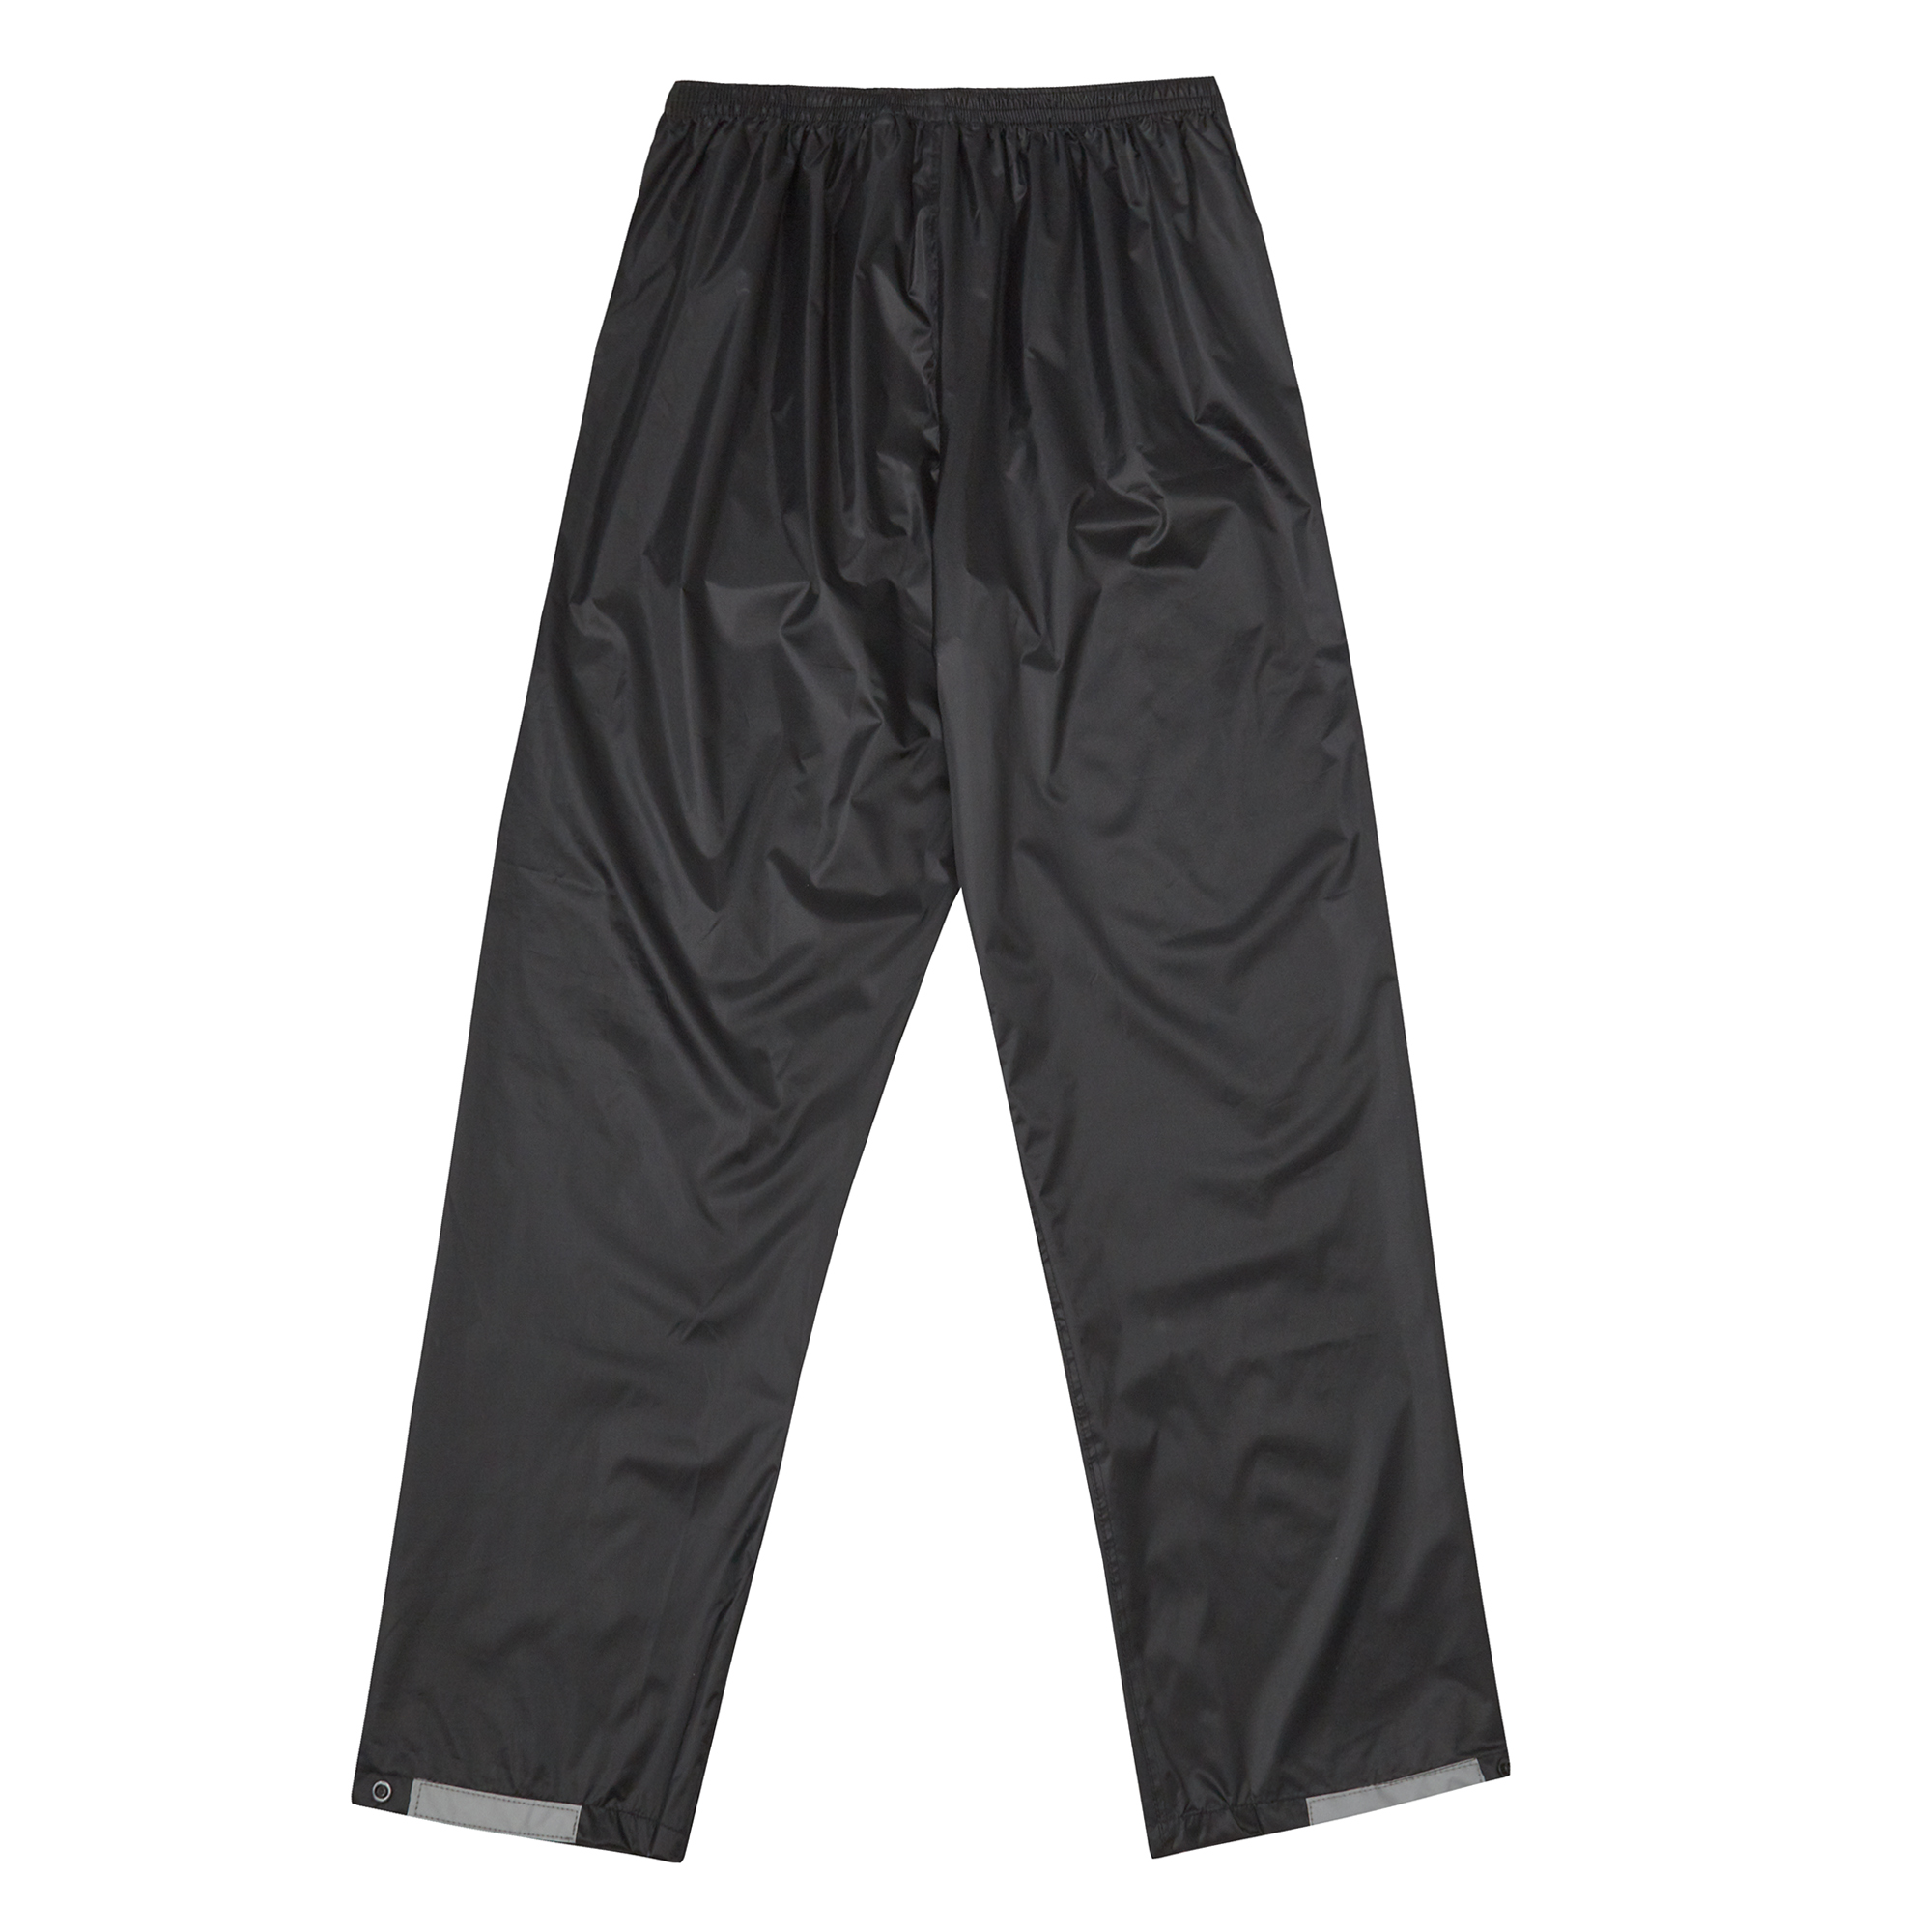 Mens-Waterproof-Water-Rain-Resitant-Pants-Bottoms-Overtrousers-Motorbike-S-XXL miniatuur 3